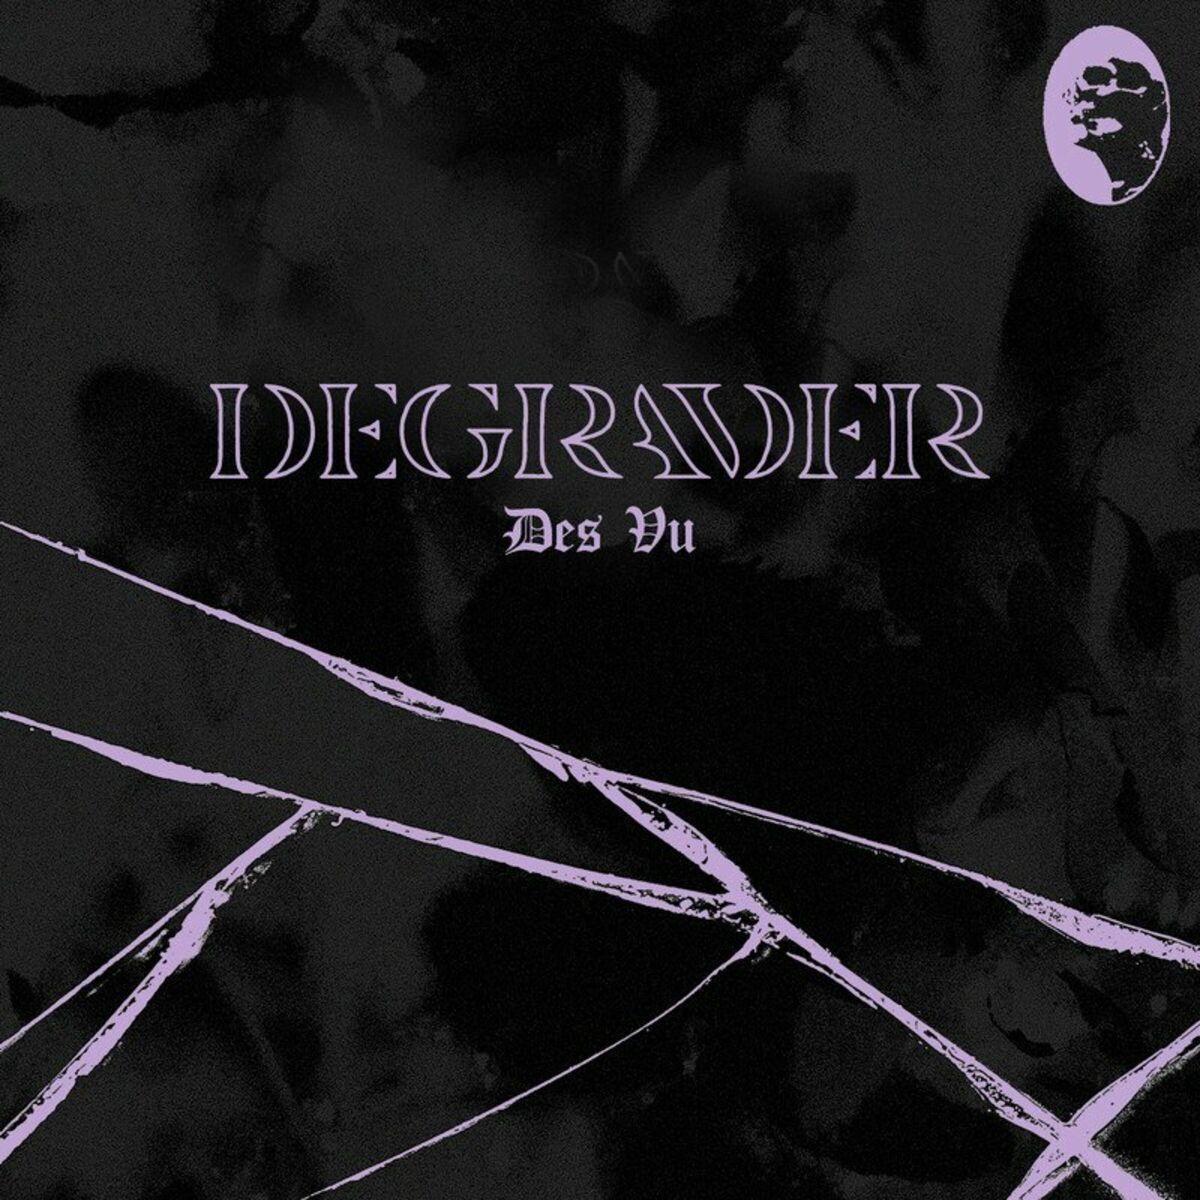 Degrader - Des Vu [single] (2021)